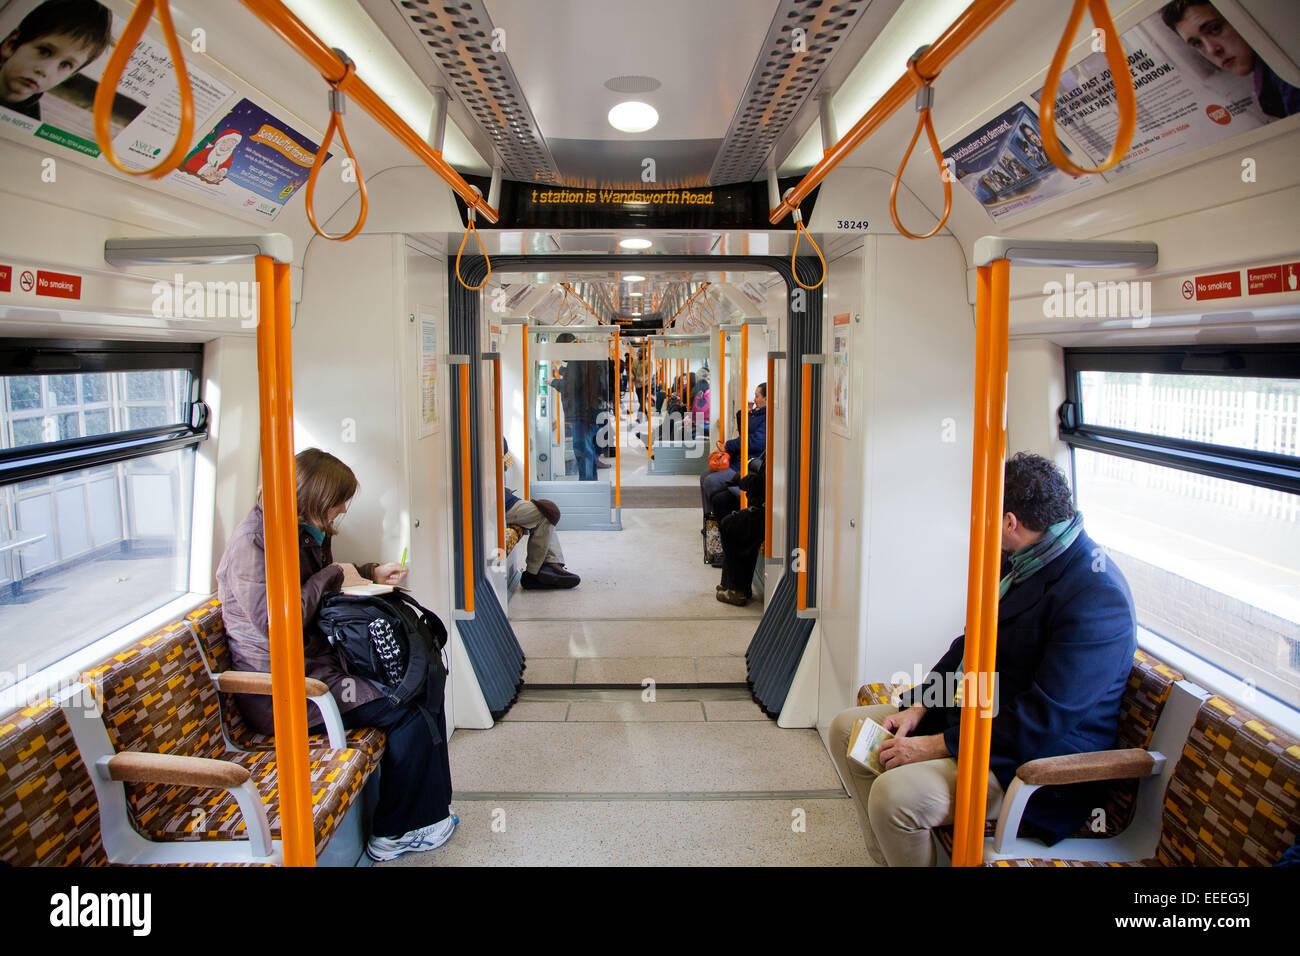 Interior of a London Overground train - Stock Image